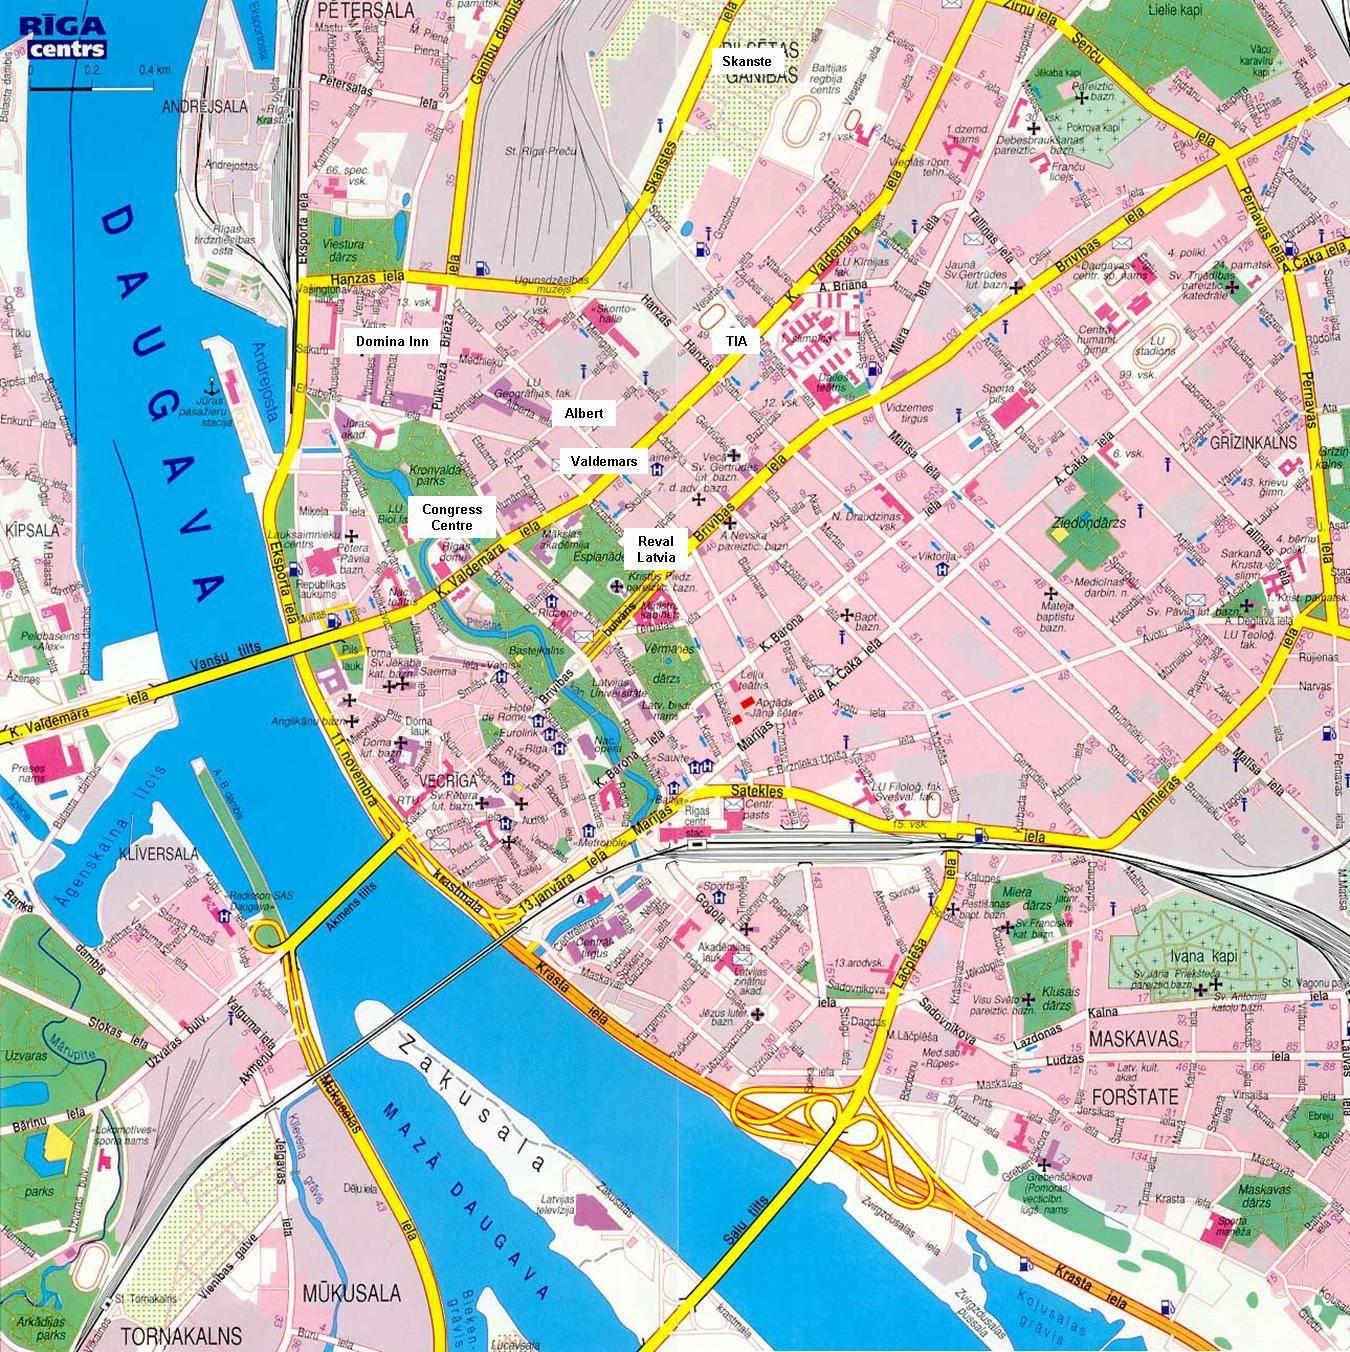 karta riga Large Riga Maps for Free Download and Print | High Resolution and  karta riga